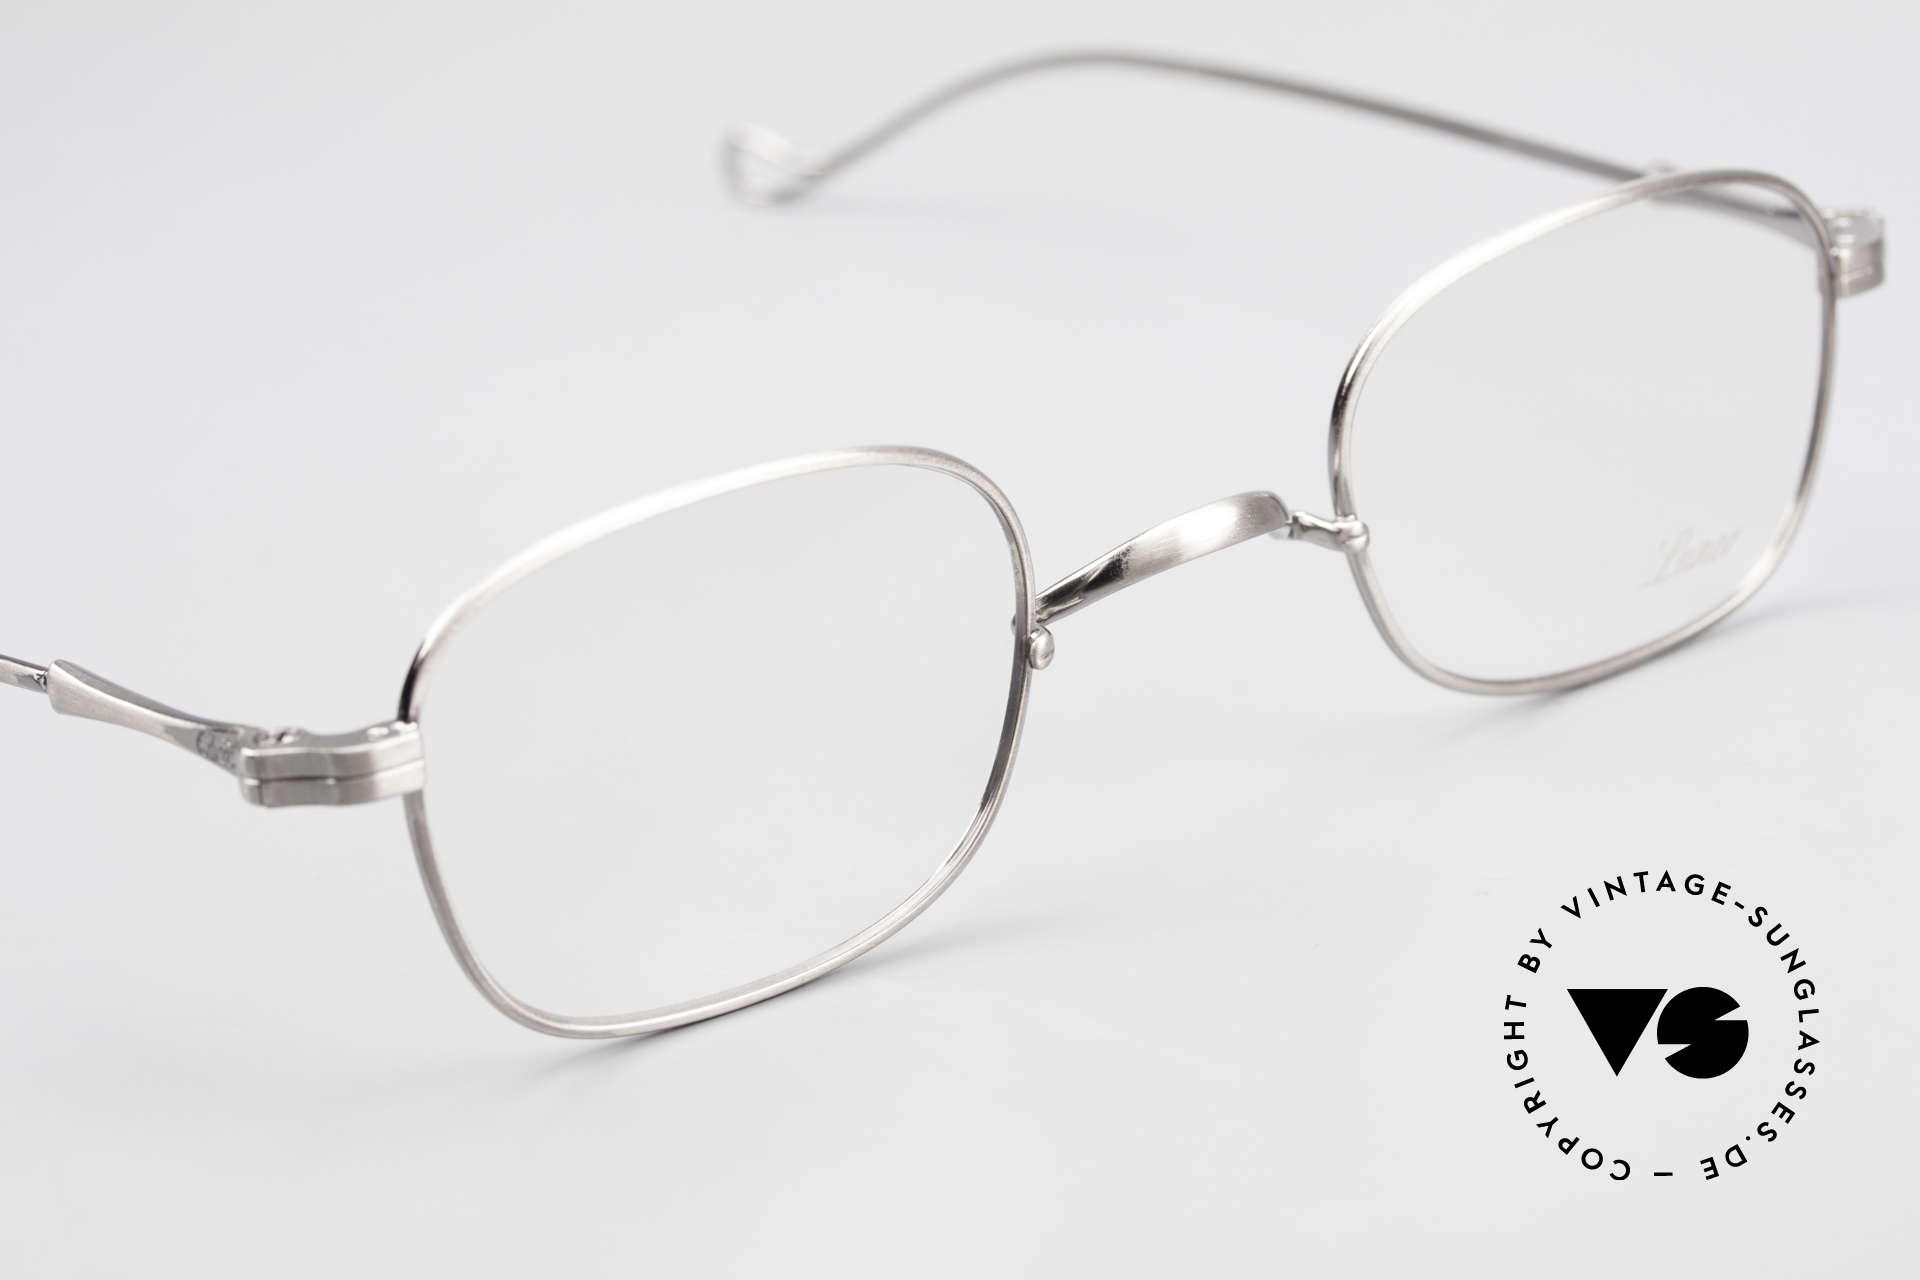 Lunor II 05 Classic Timeless Eyeglasses, NO RETRO EYEGLASSES; but a luxury vintage Original, Made for Men and Women